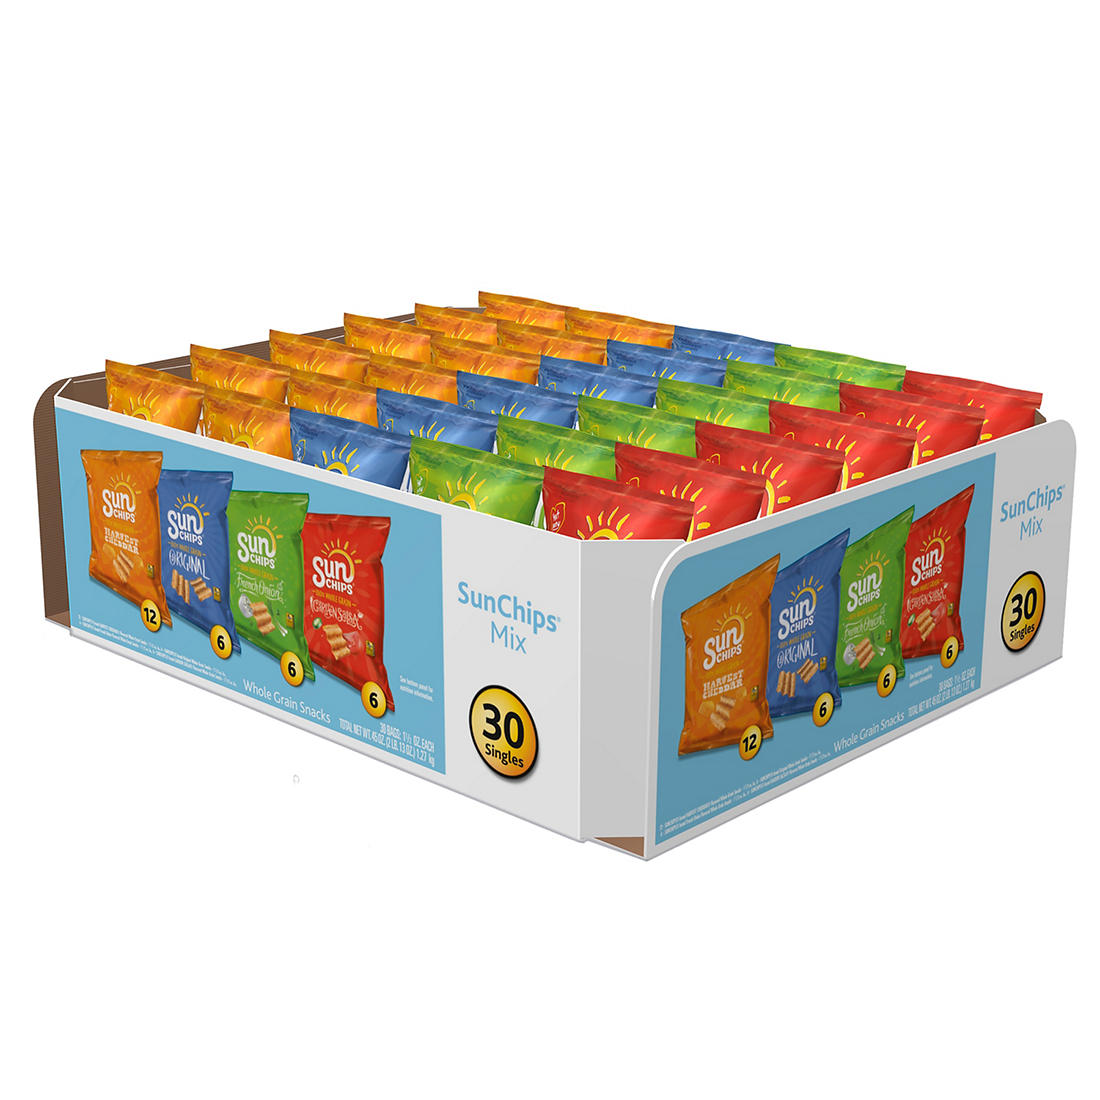 Frito Lay Sun Chips Whole Grain Variety Pack, 30 ct /1 5 oz